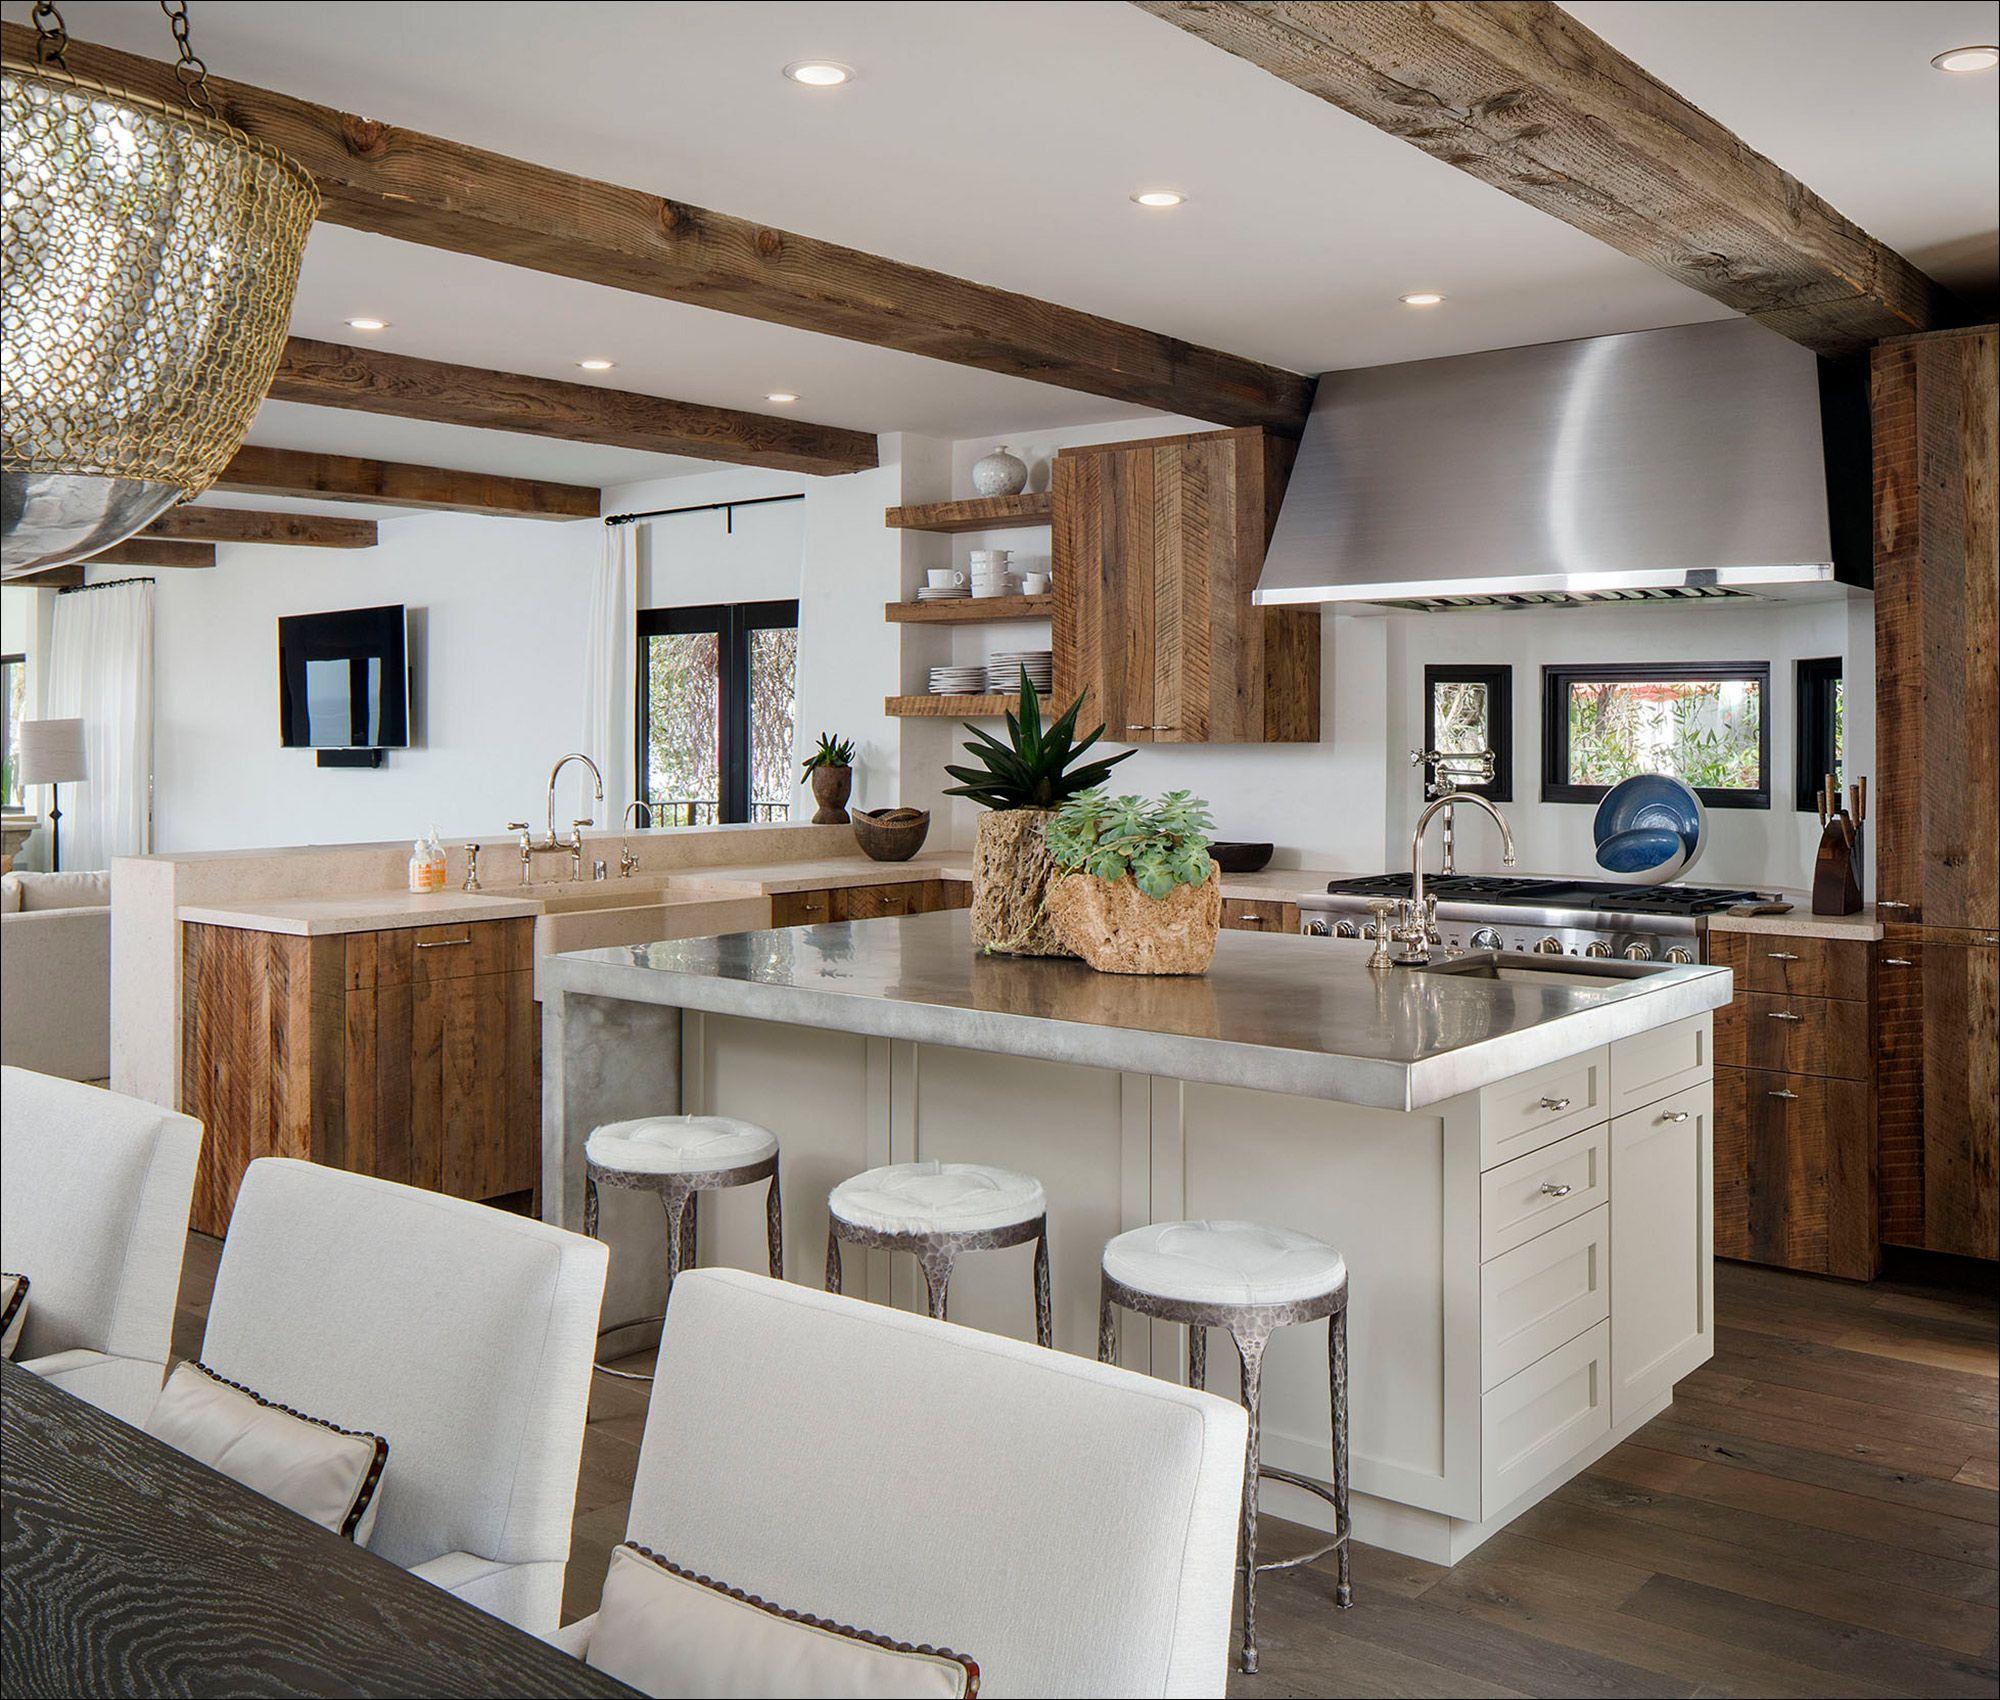 MelindaGrubbsInteriors_LagunaBeach_Kitchen_InteriorDesignPhotography.jpg